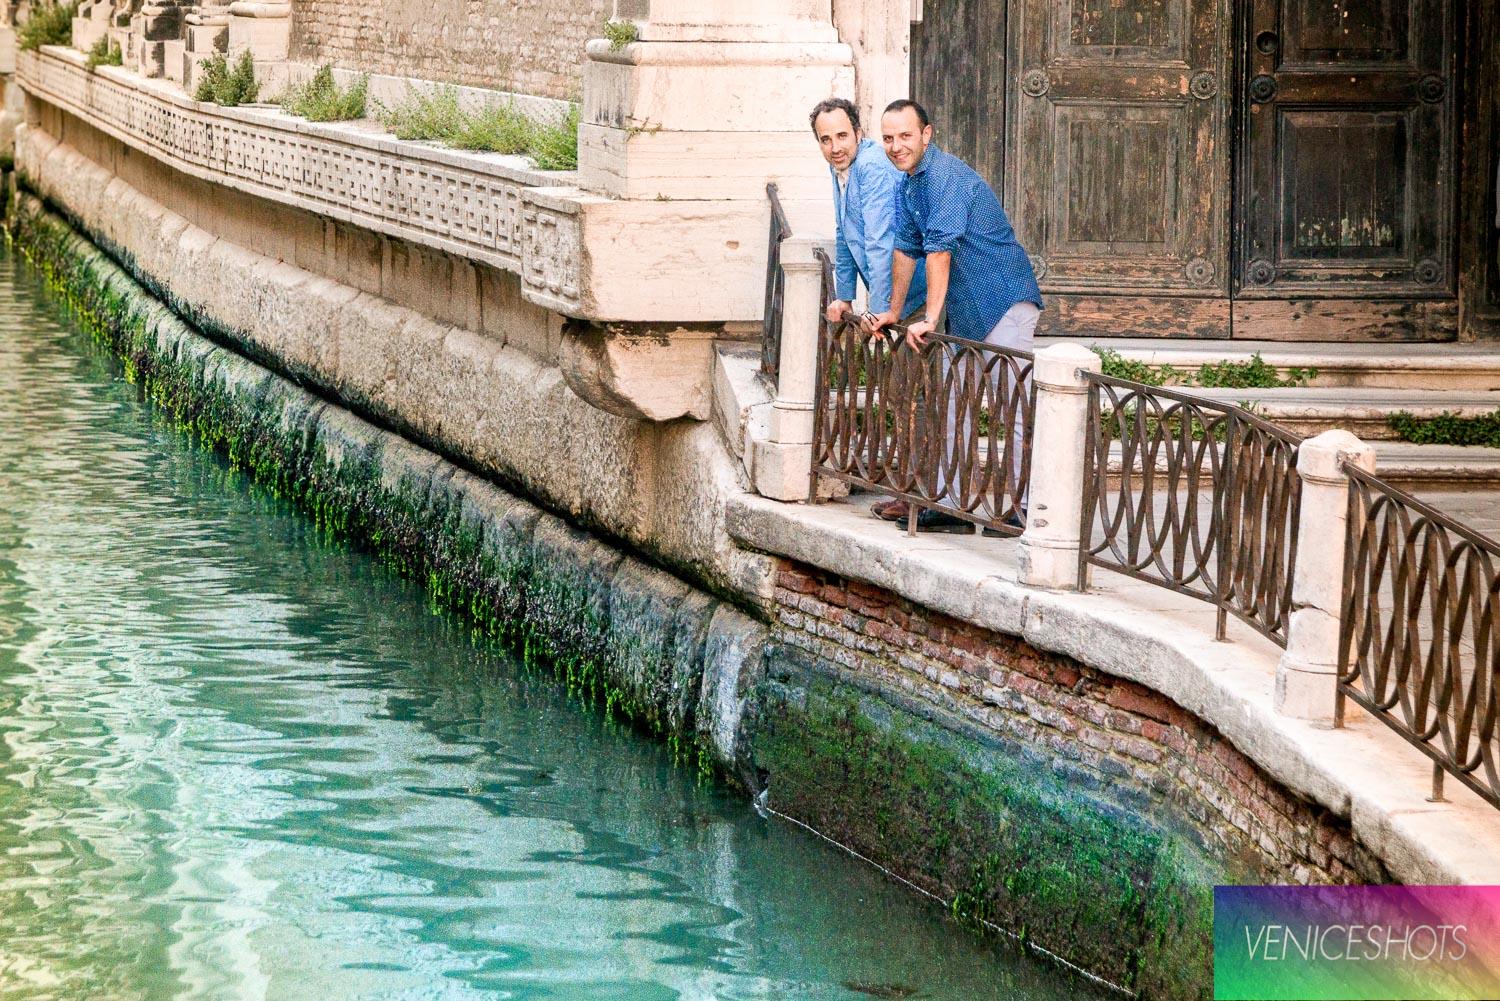 fotografia professionale Venezia_copyright claudia Rossini veniceshots.com_3609_veniceshots.com_alta risoluz_.jpg